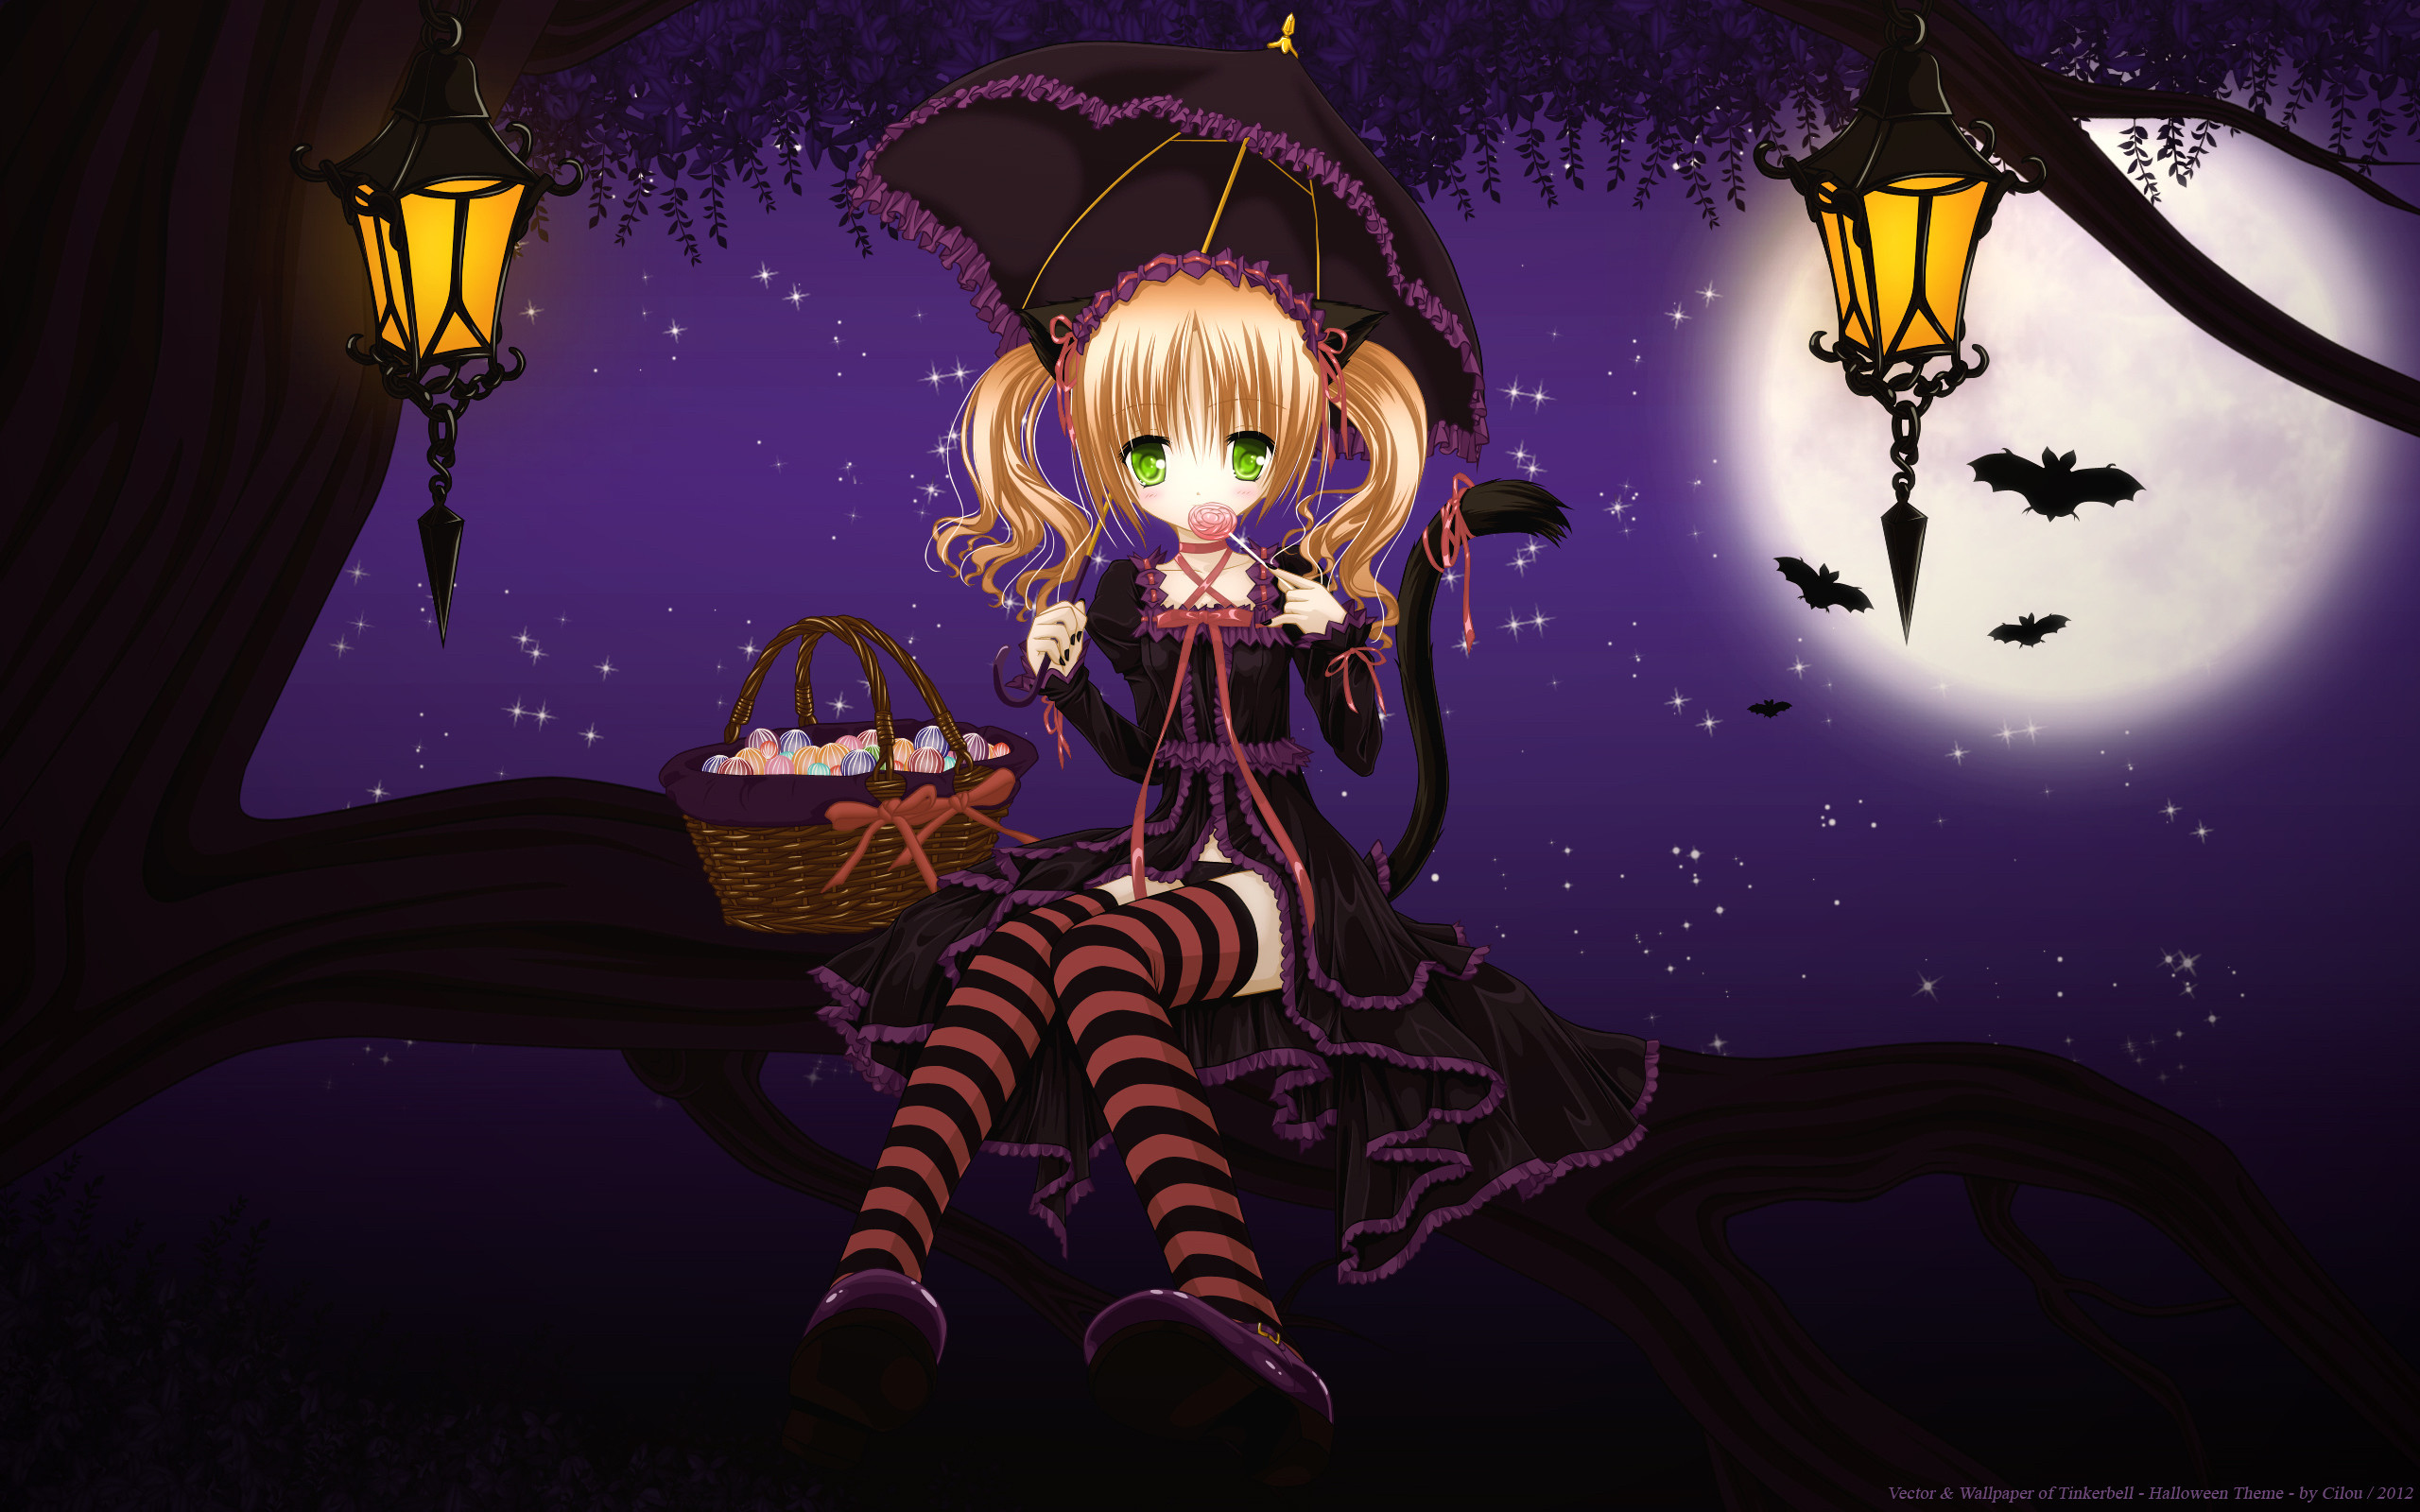 Cute Halloween Anime Girl | Halloween Anime | Pinterest | Anime. Cute Halloween  Anime Girl Halloween Anime Pinterest Anime